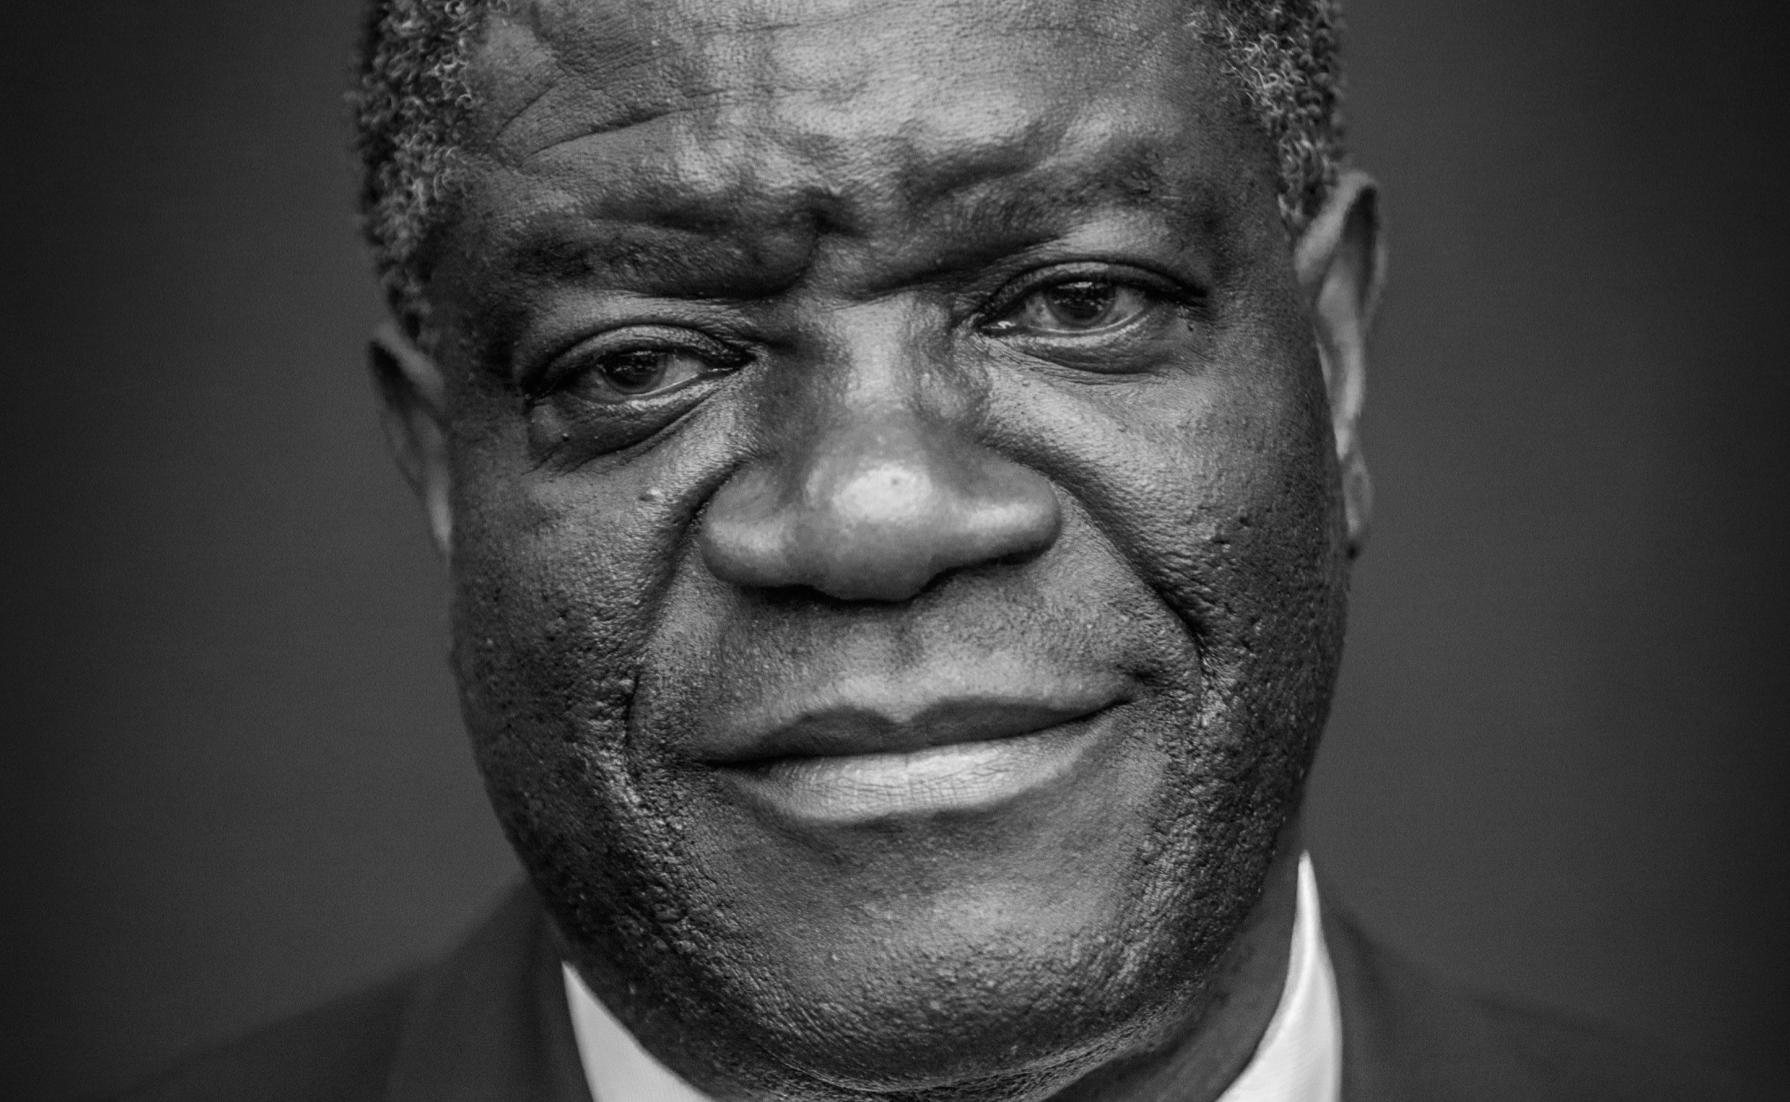 Pentecostal Nobel Peace Prize Winner Denis Mukwege Gives Glory to God